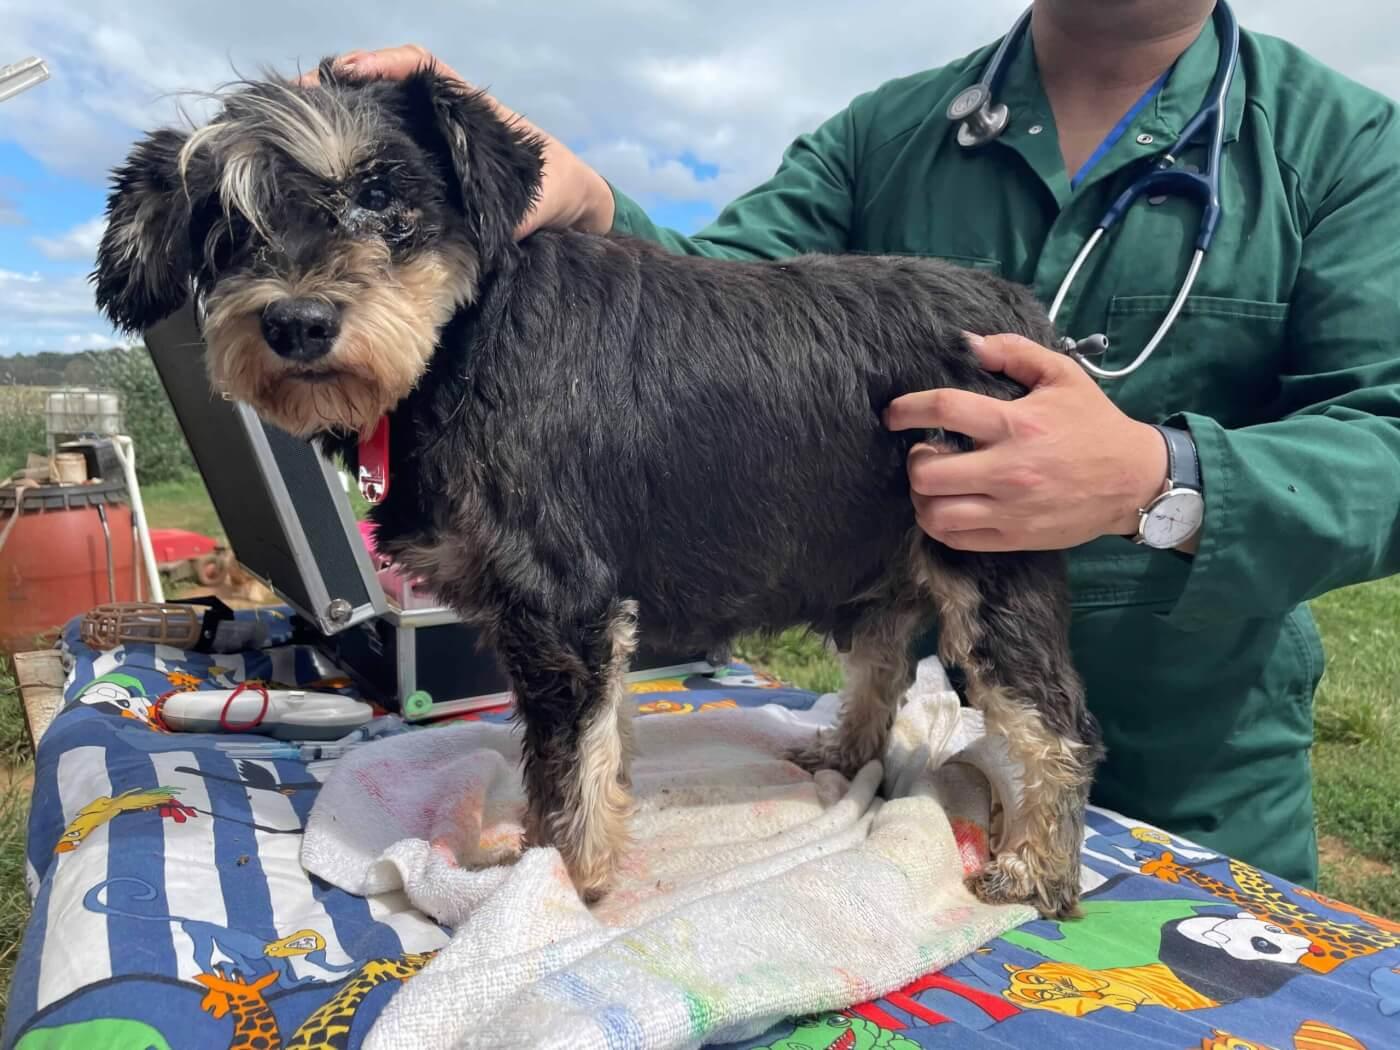 A dog seized in the RSPCA raid.